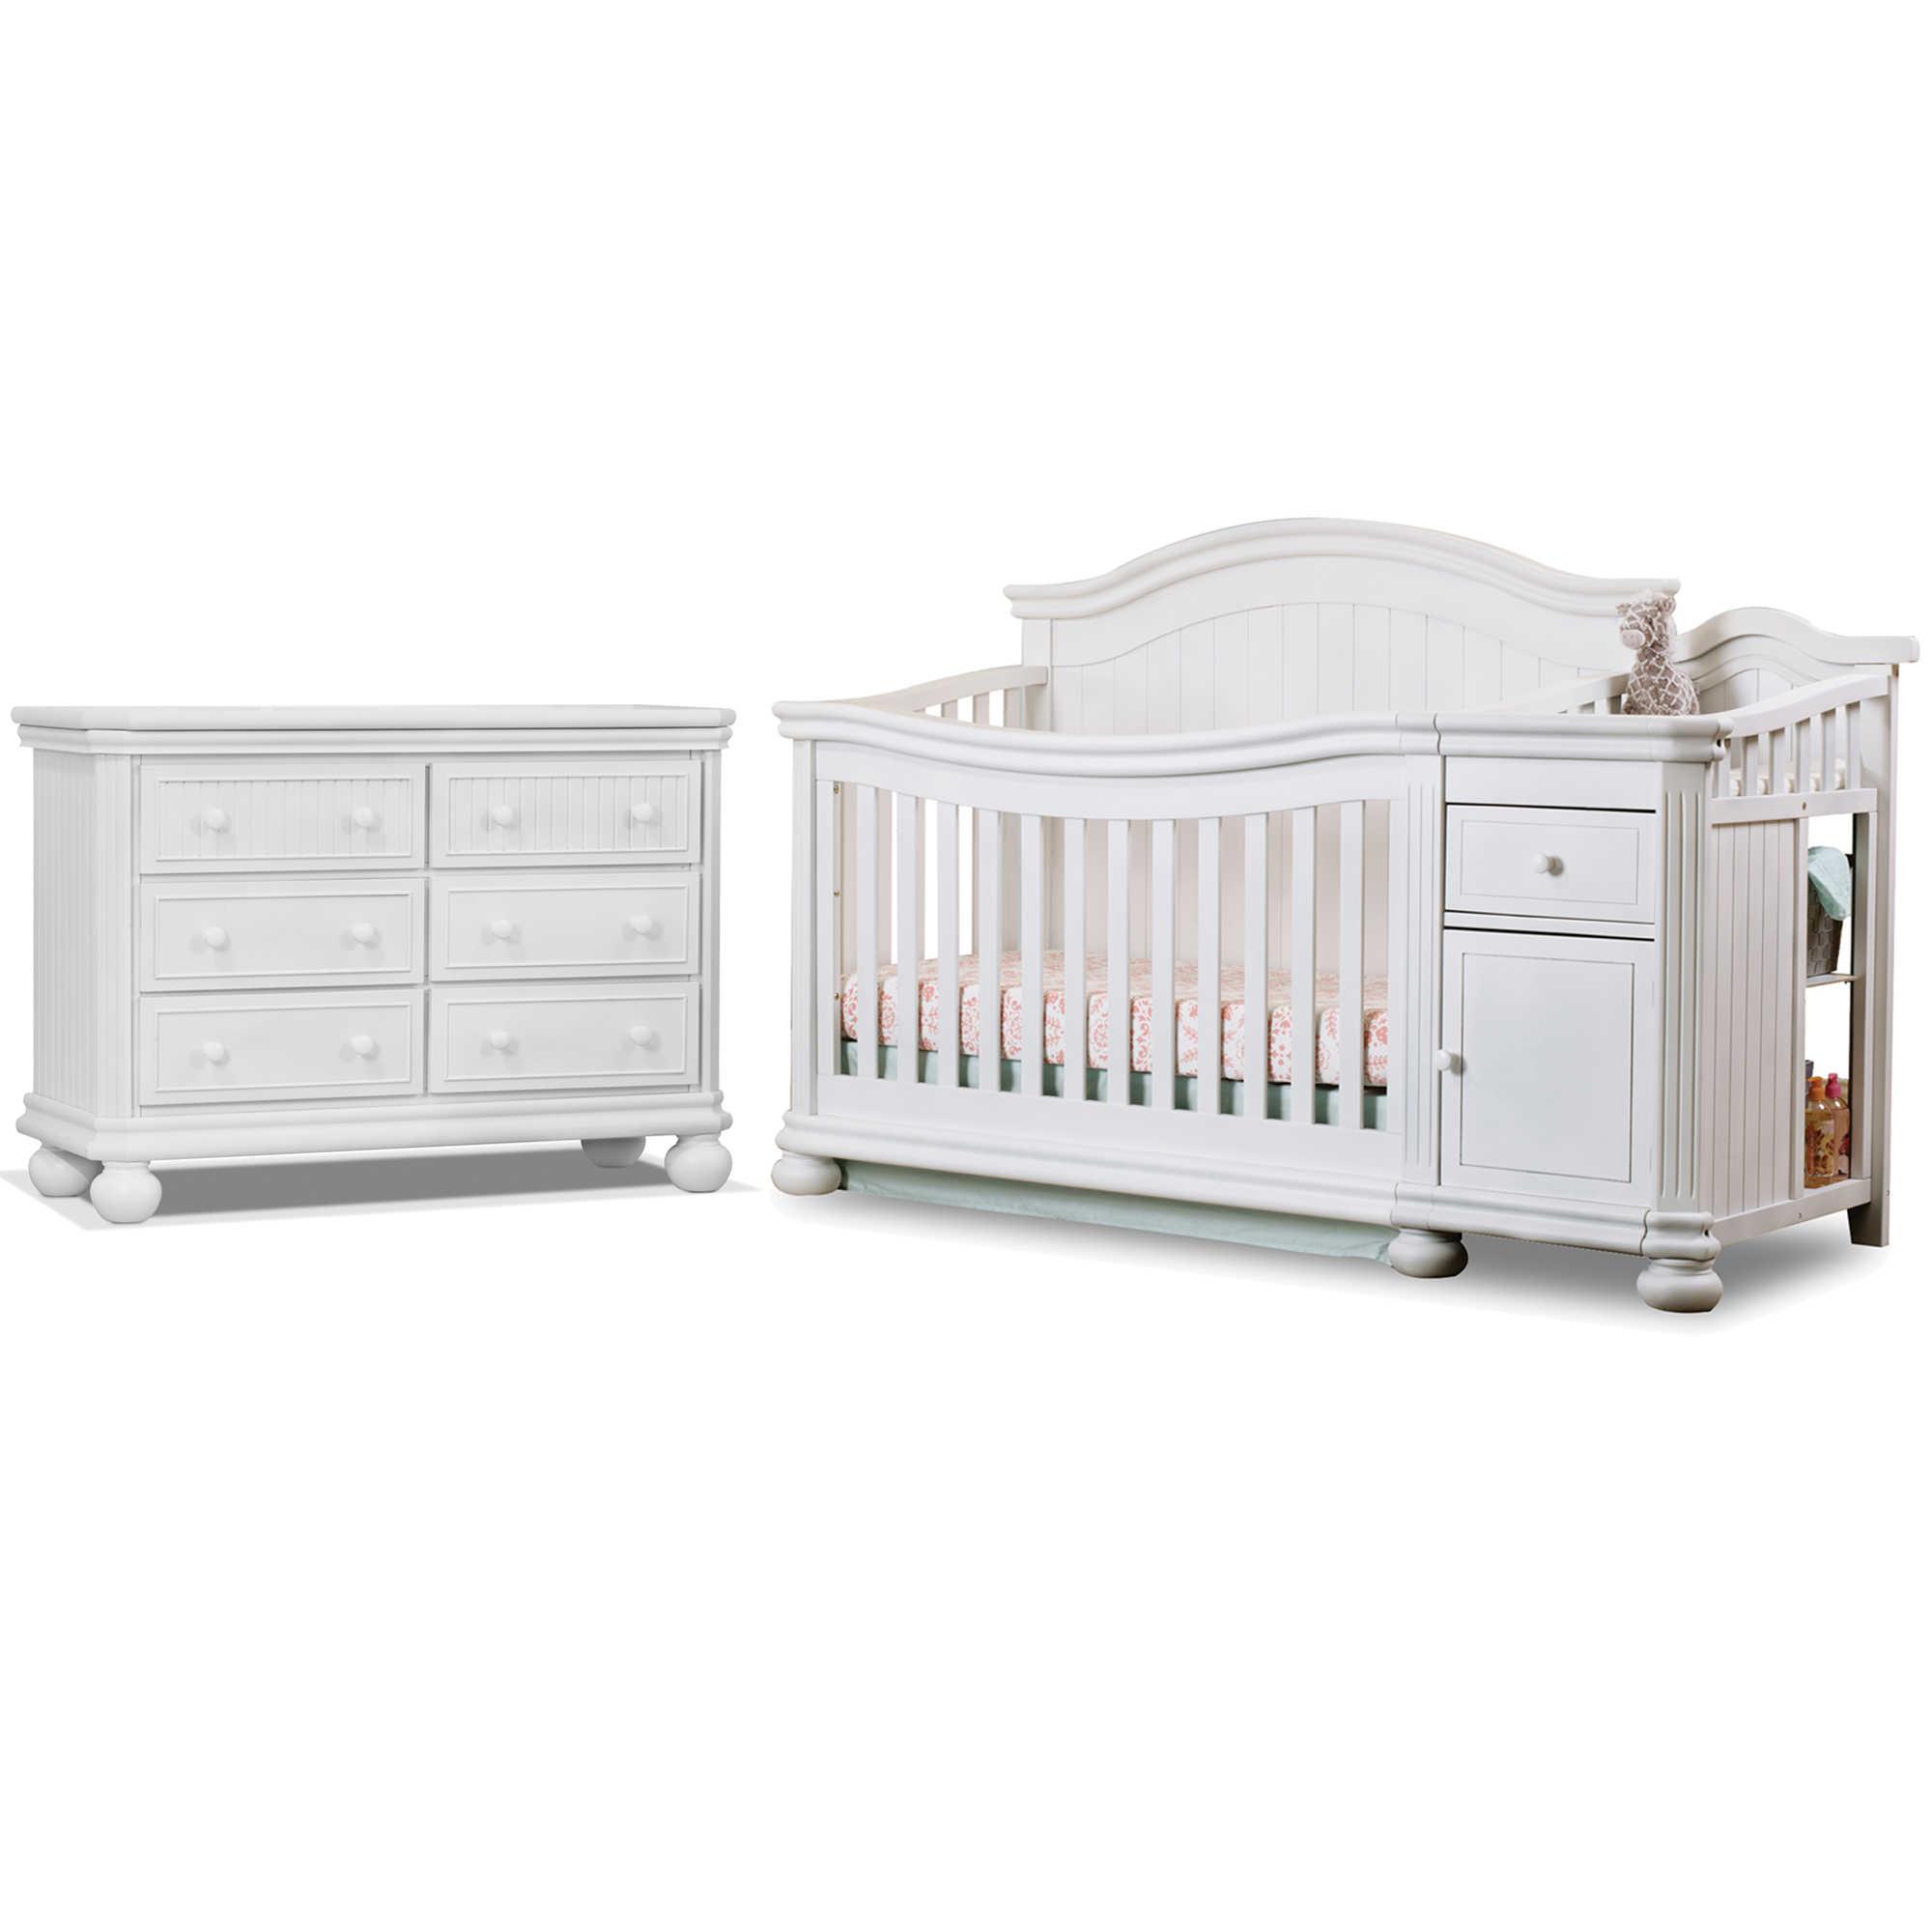 white fairbanks walmart crib convertible evolur com with drawers in ip